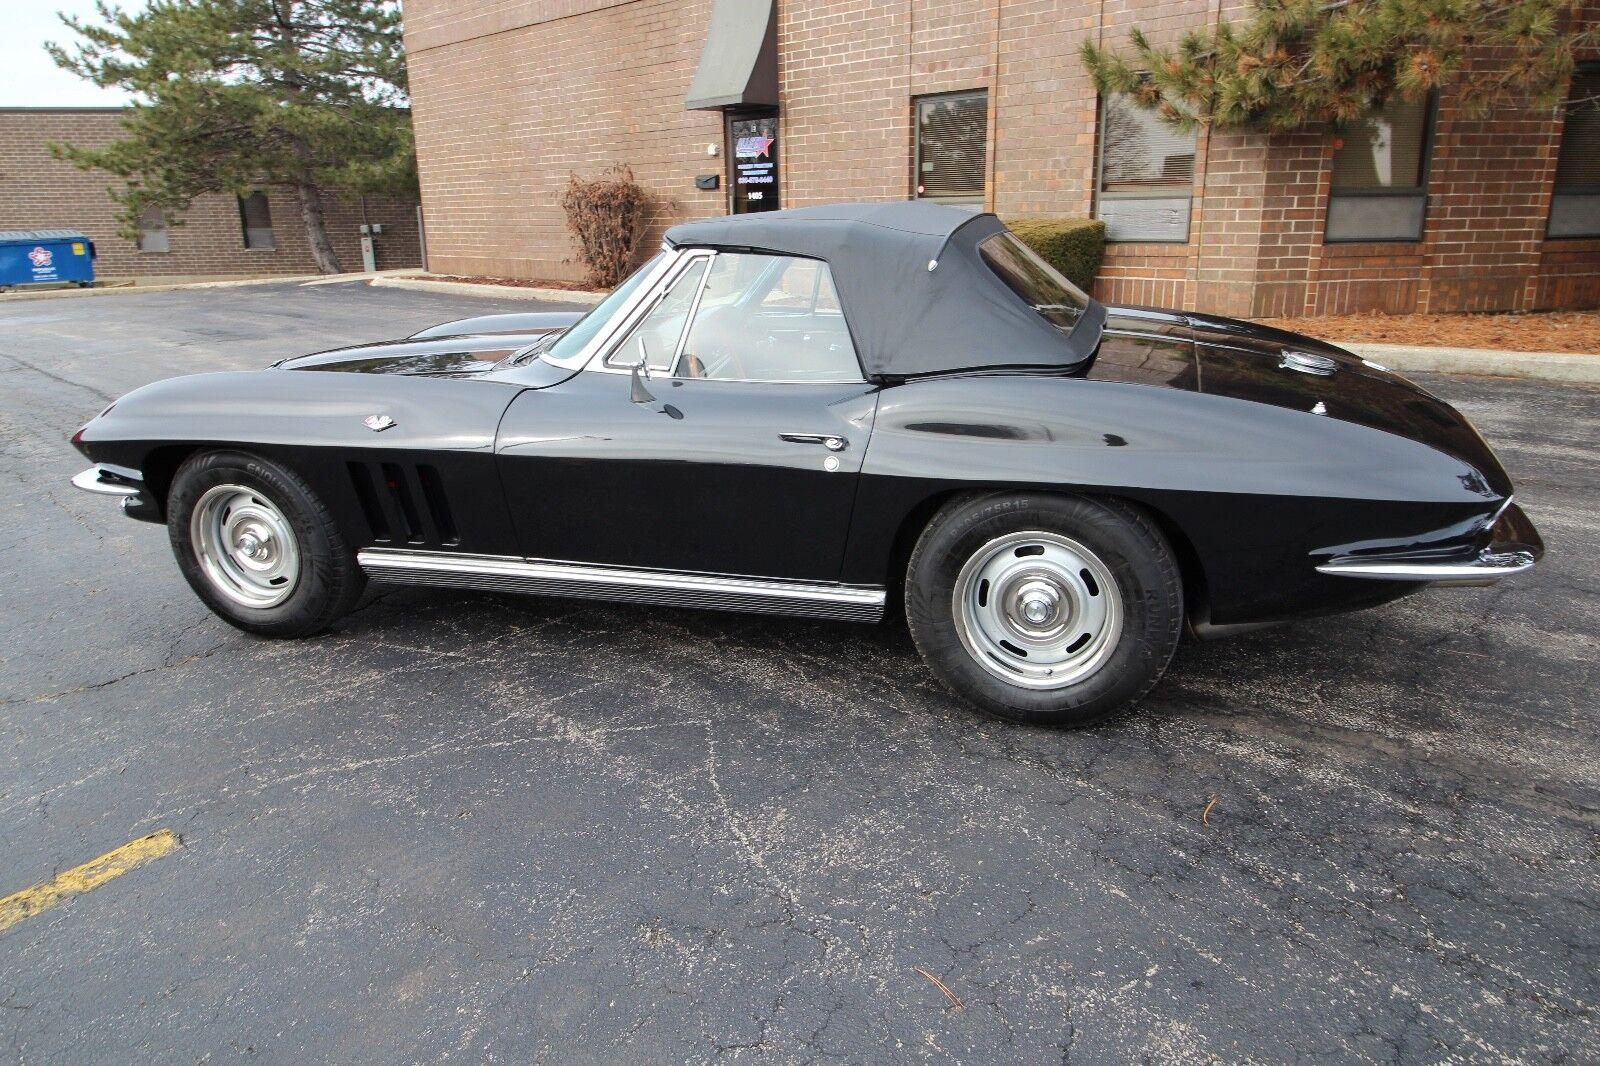 1966 Black Chevrolet Corvette   | C2 Corvette Photo 1